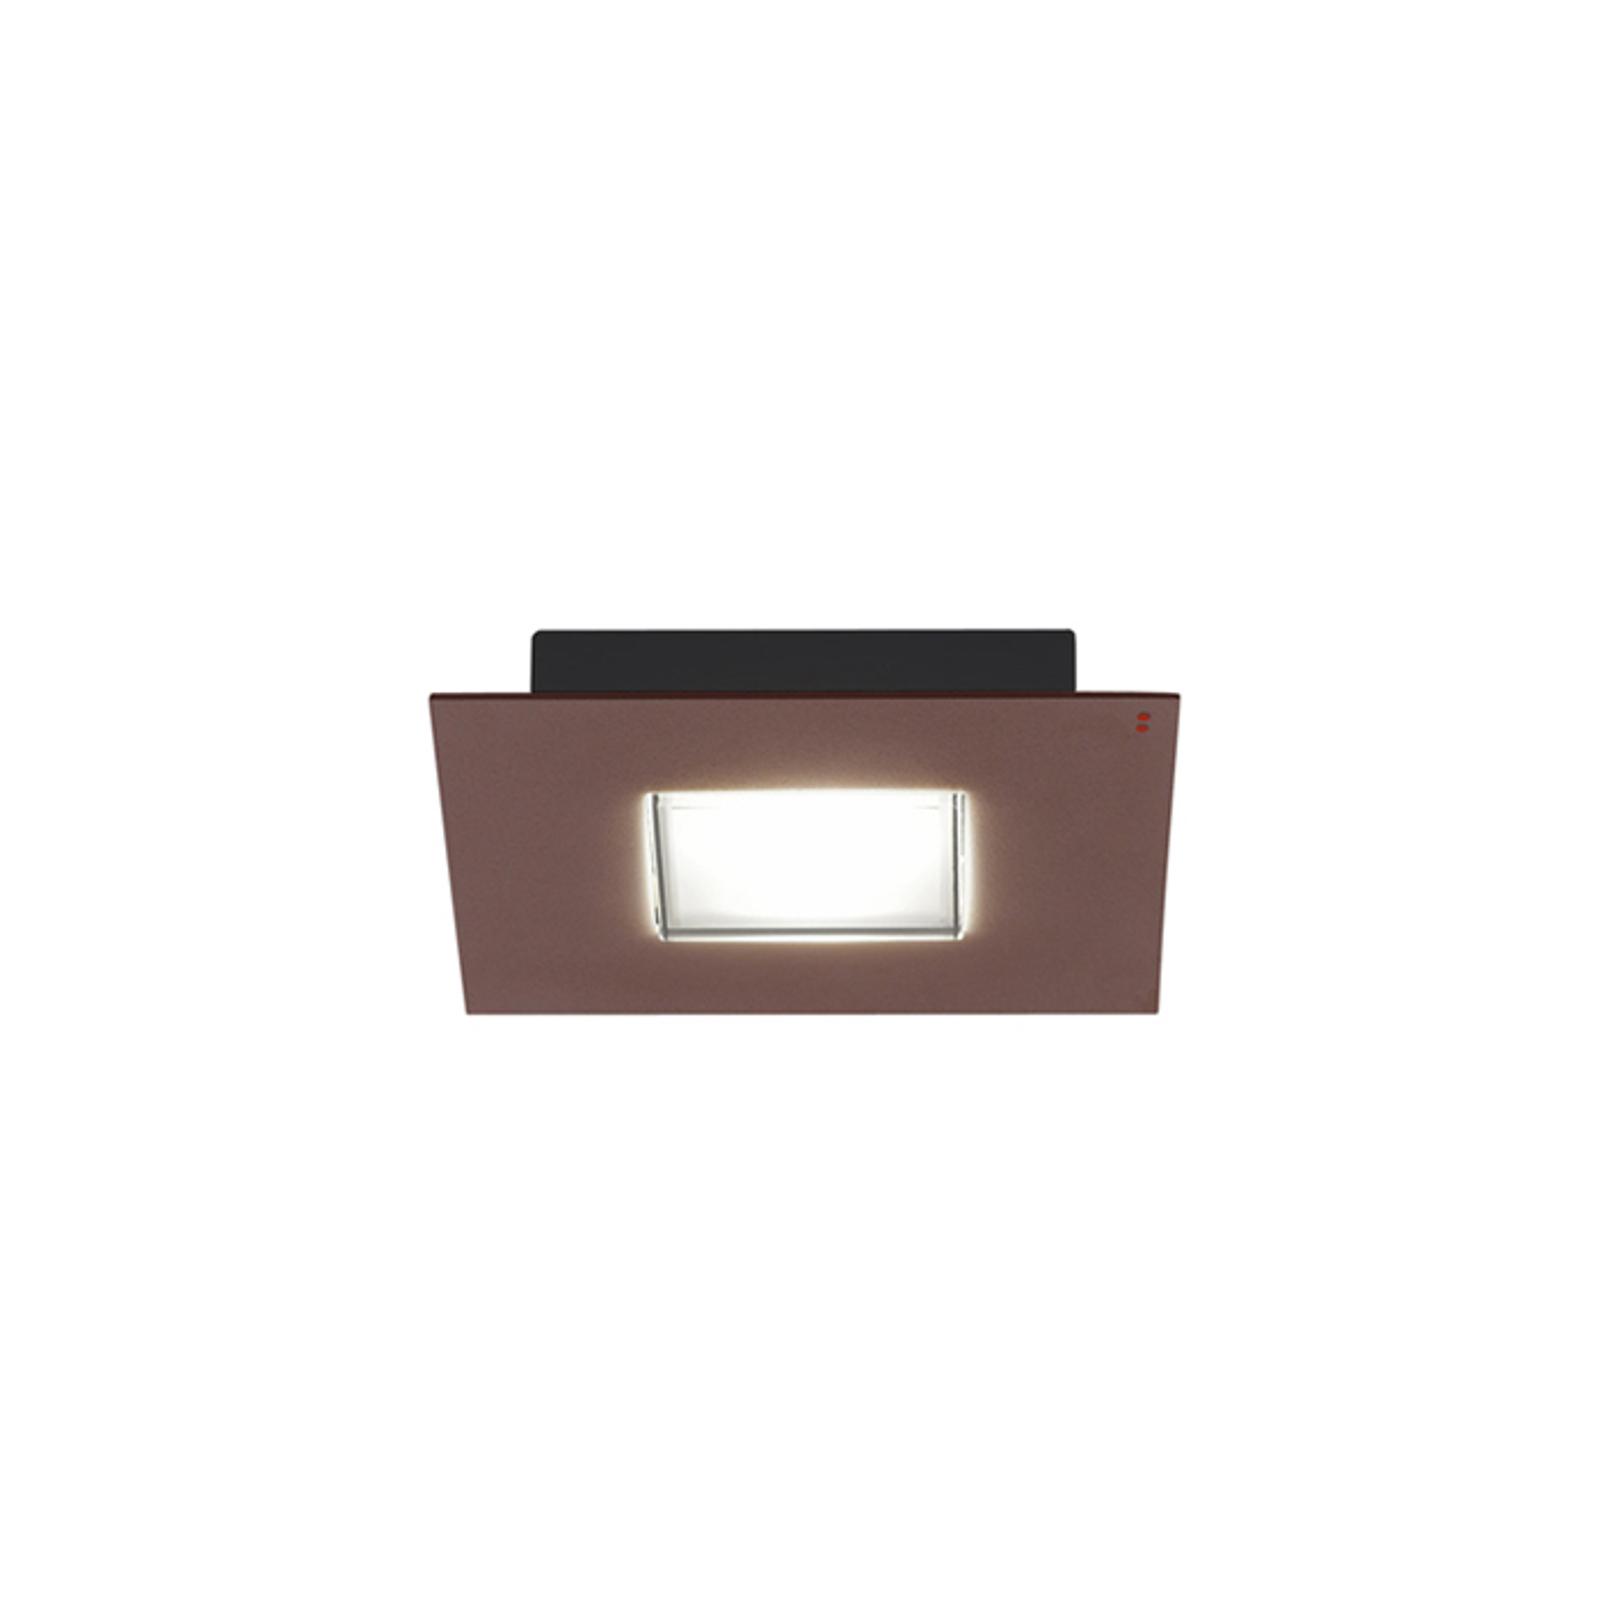 Quarter - een LED plafondlamp met bruine rand